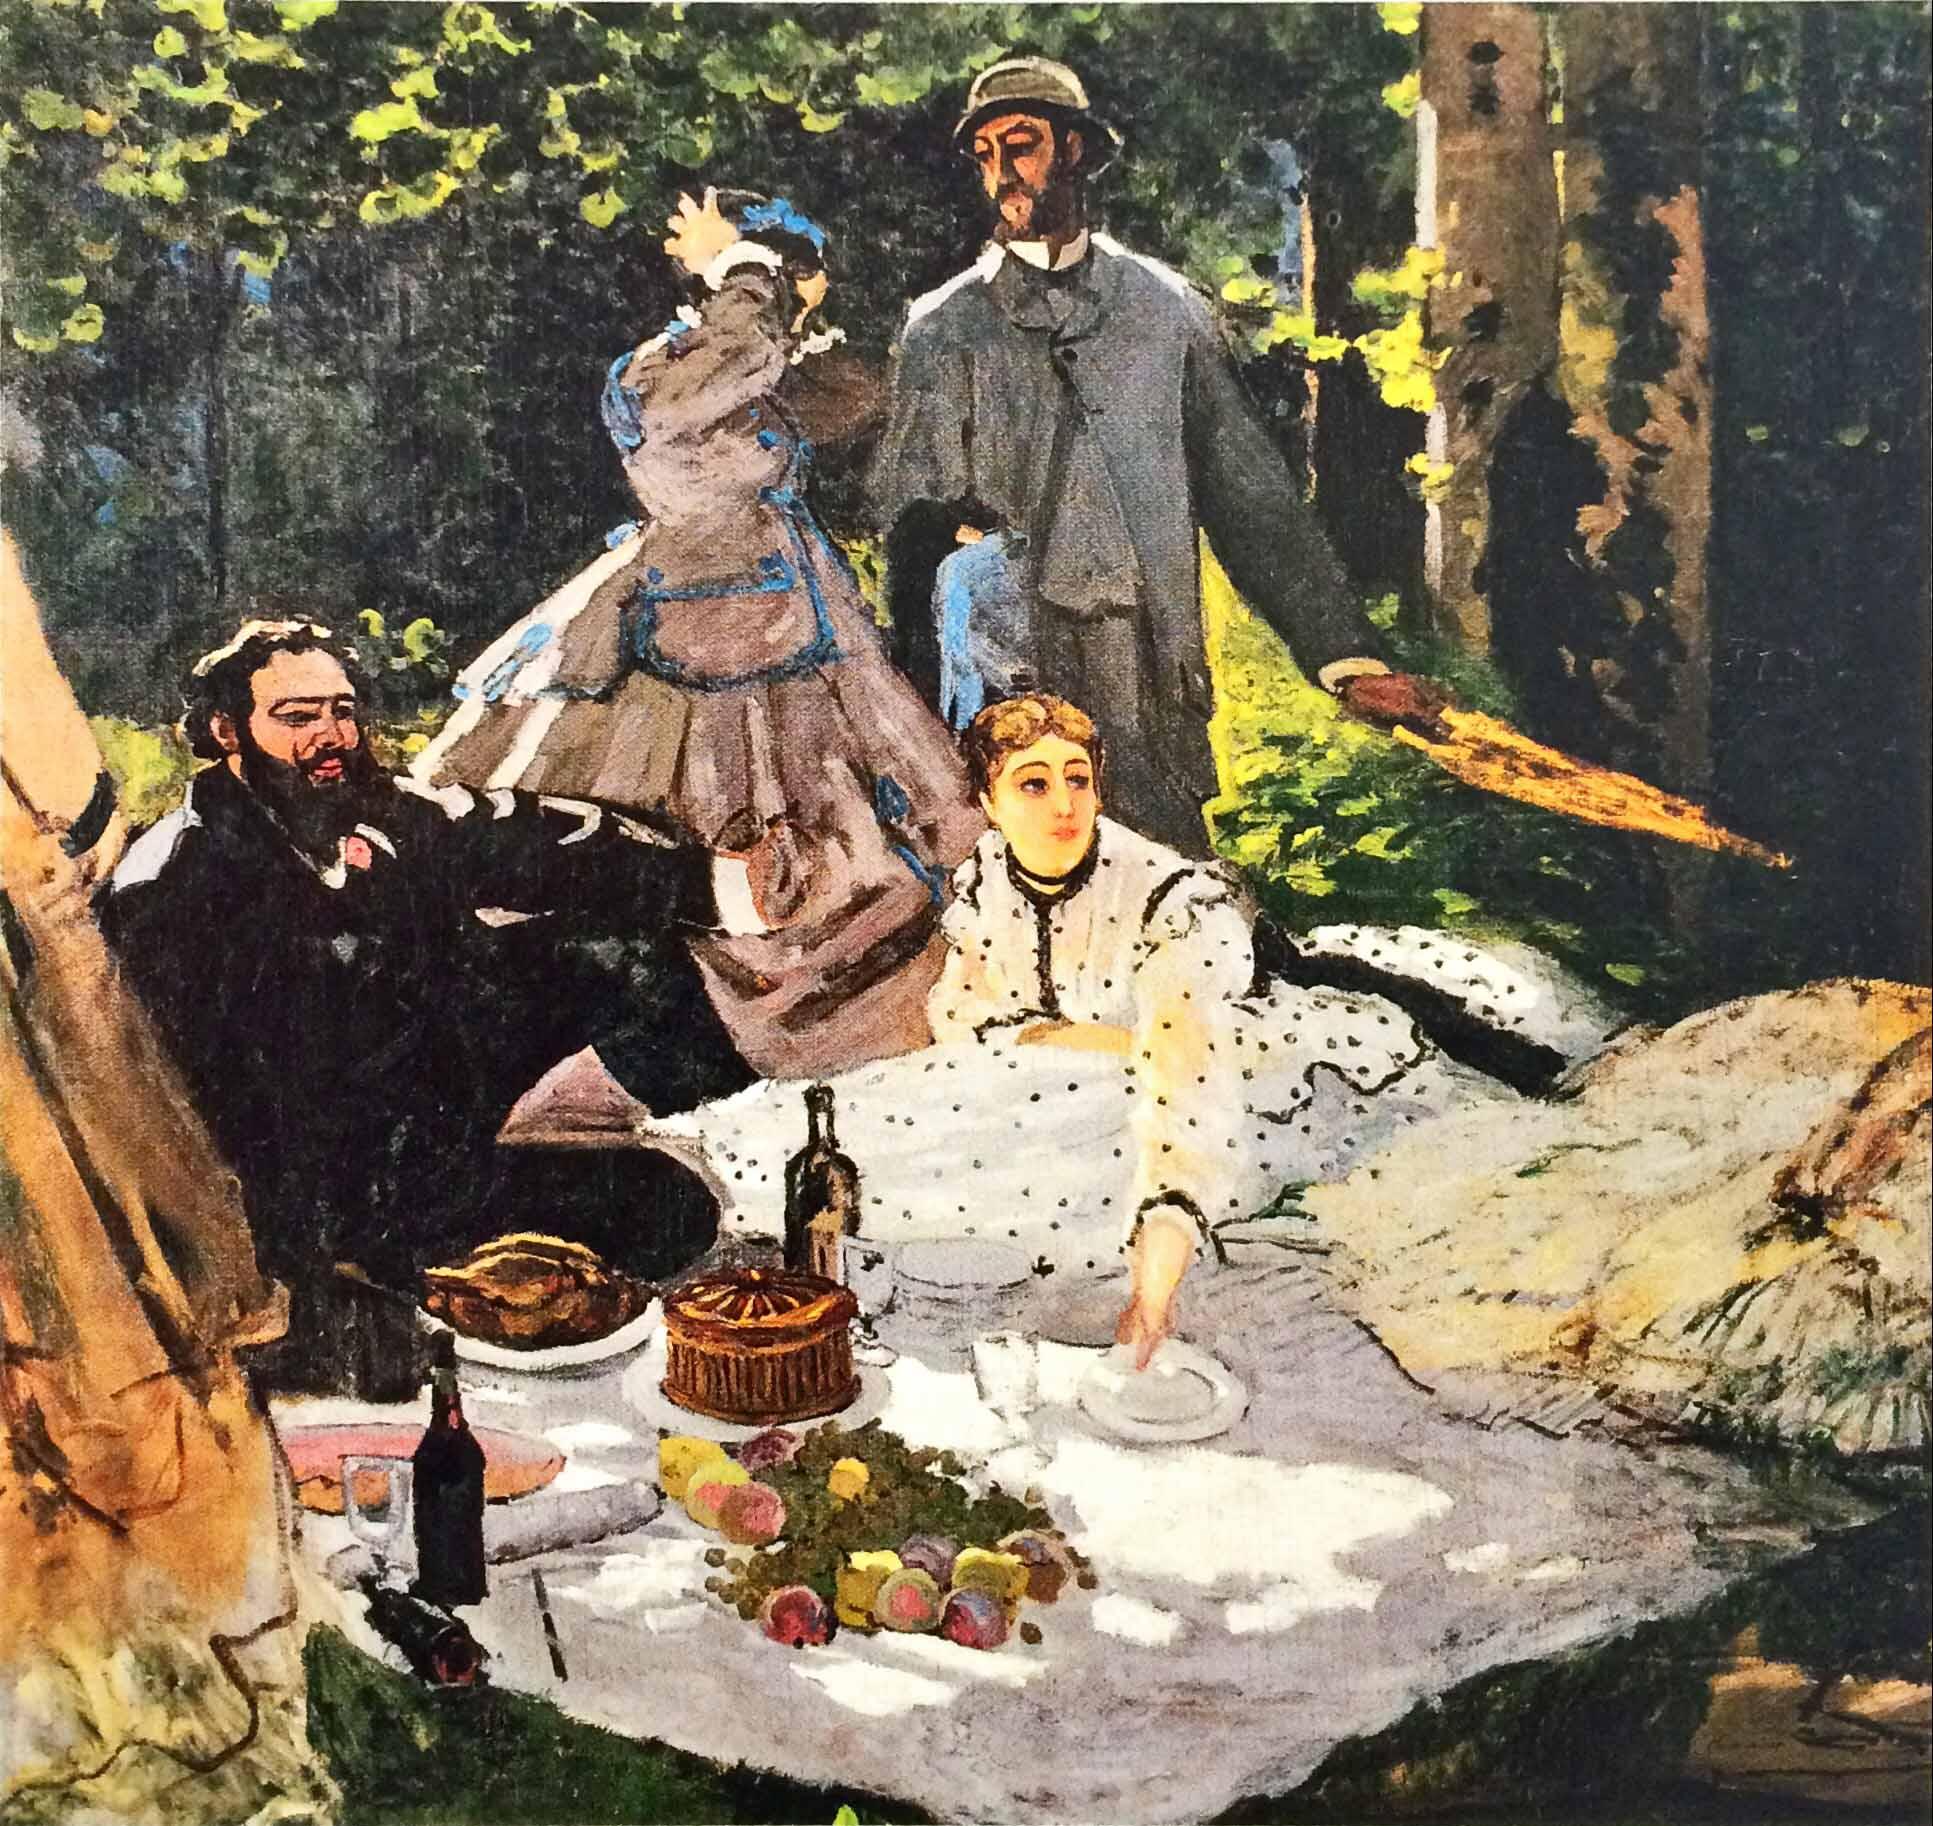 Завтрак на траве (Пикник) :: Клод Моне, описание картины - Моне Клод (Claude Monet) фото